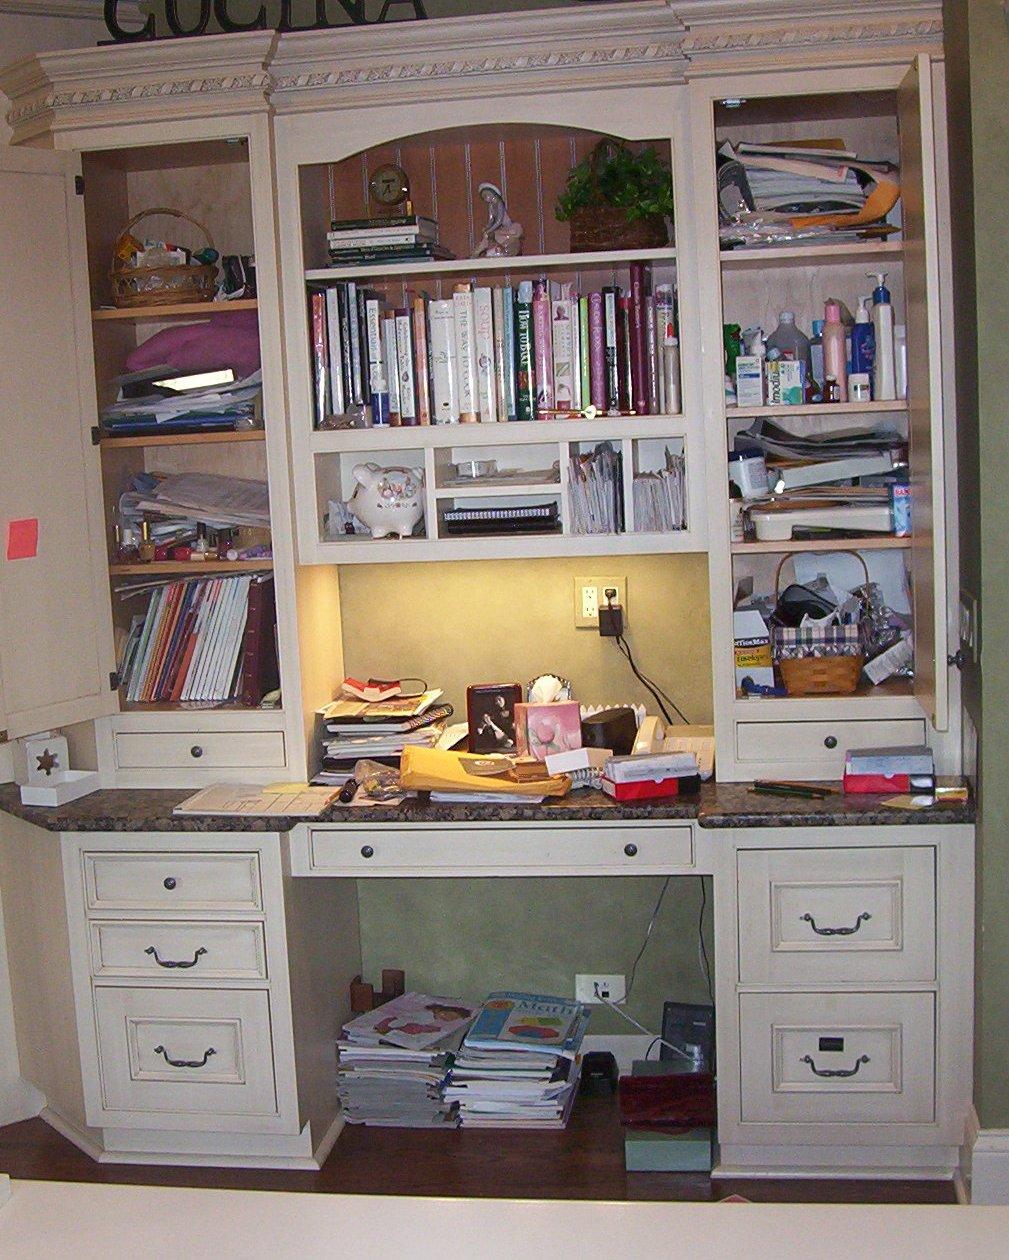 Professional Organizer, Professional Organizing, Organizing For Homes